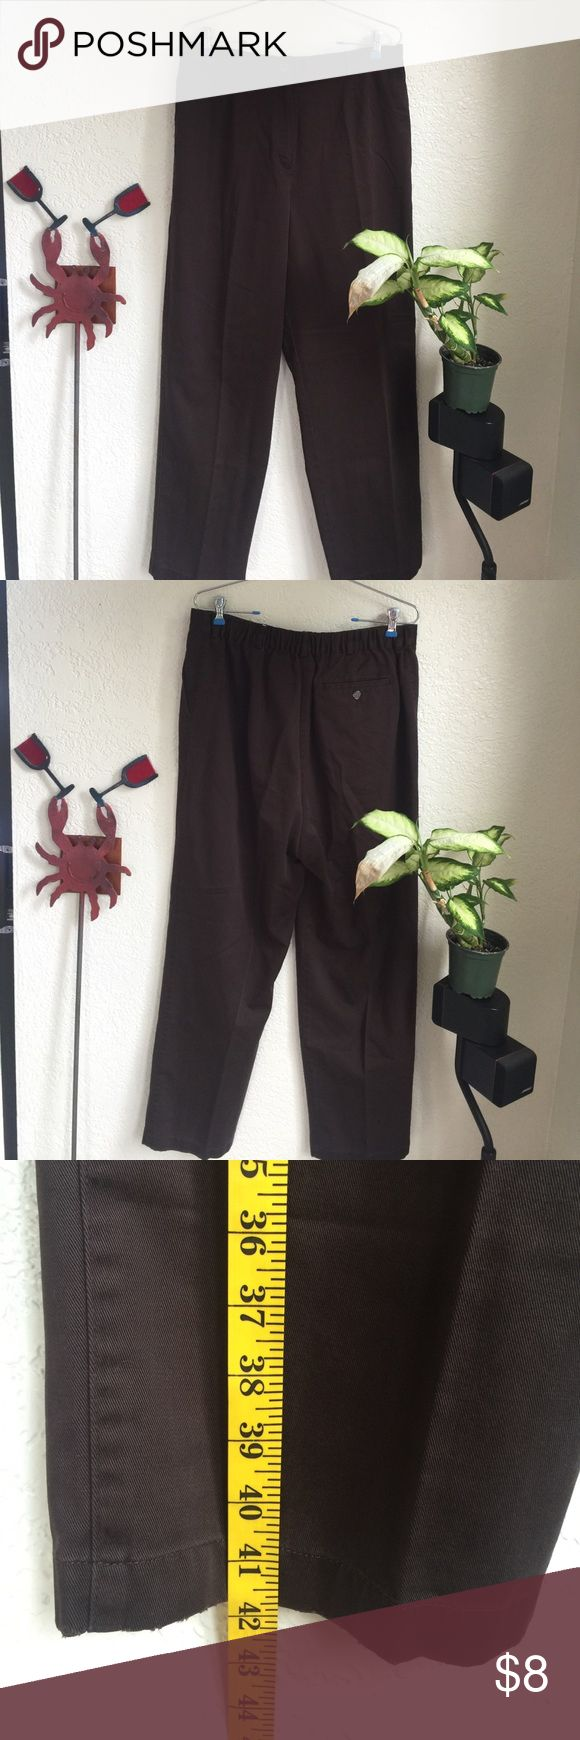 L.L bean women's brown trousers Good Condition L.L. Bean Pants Trousers